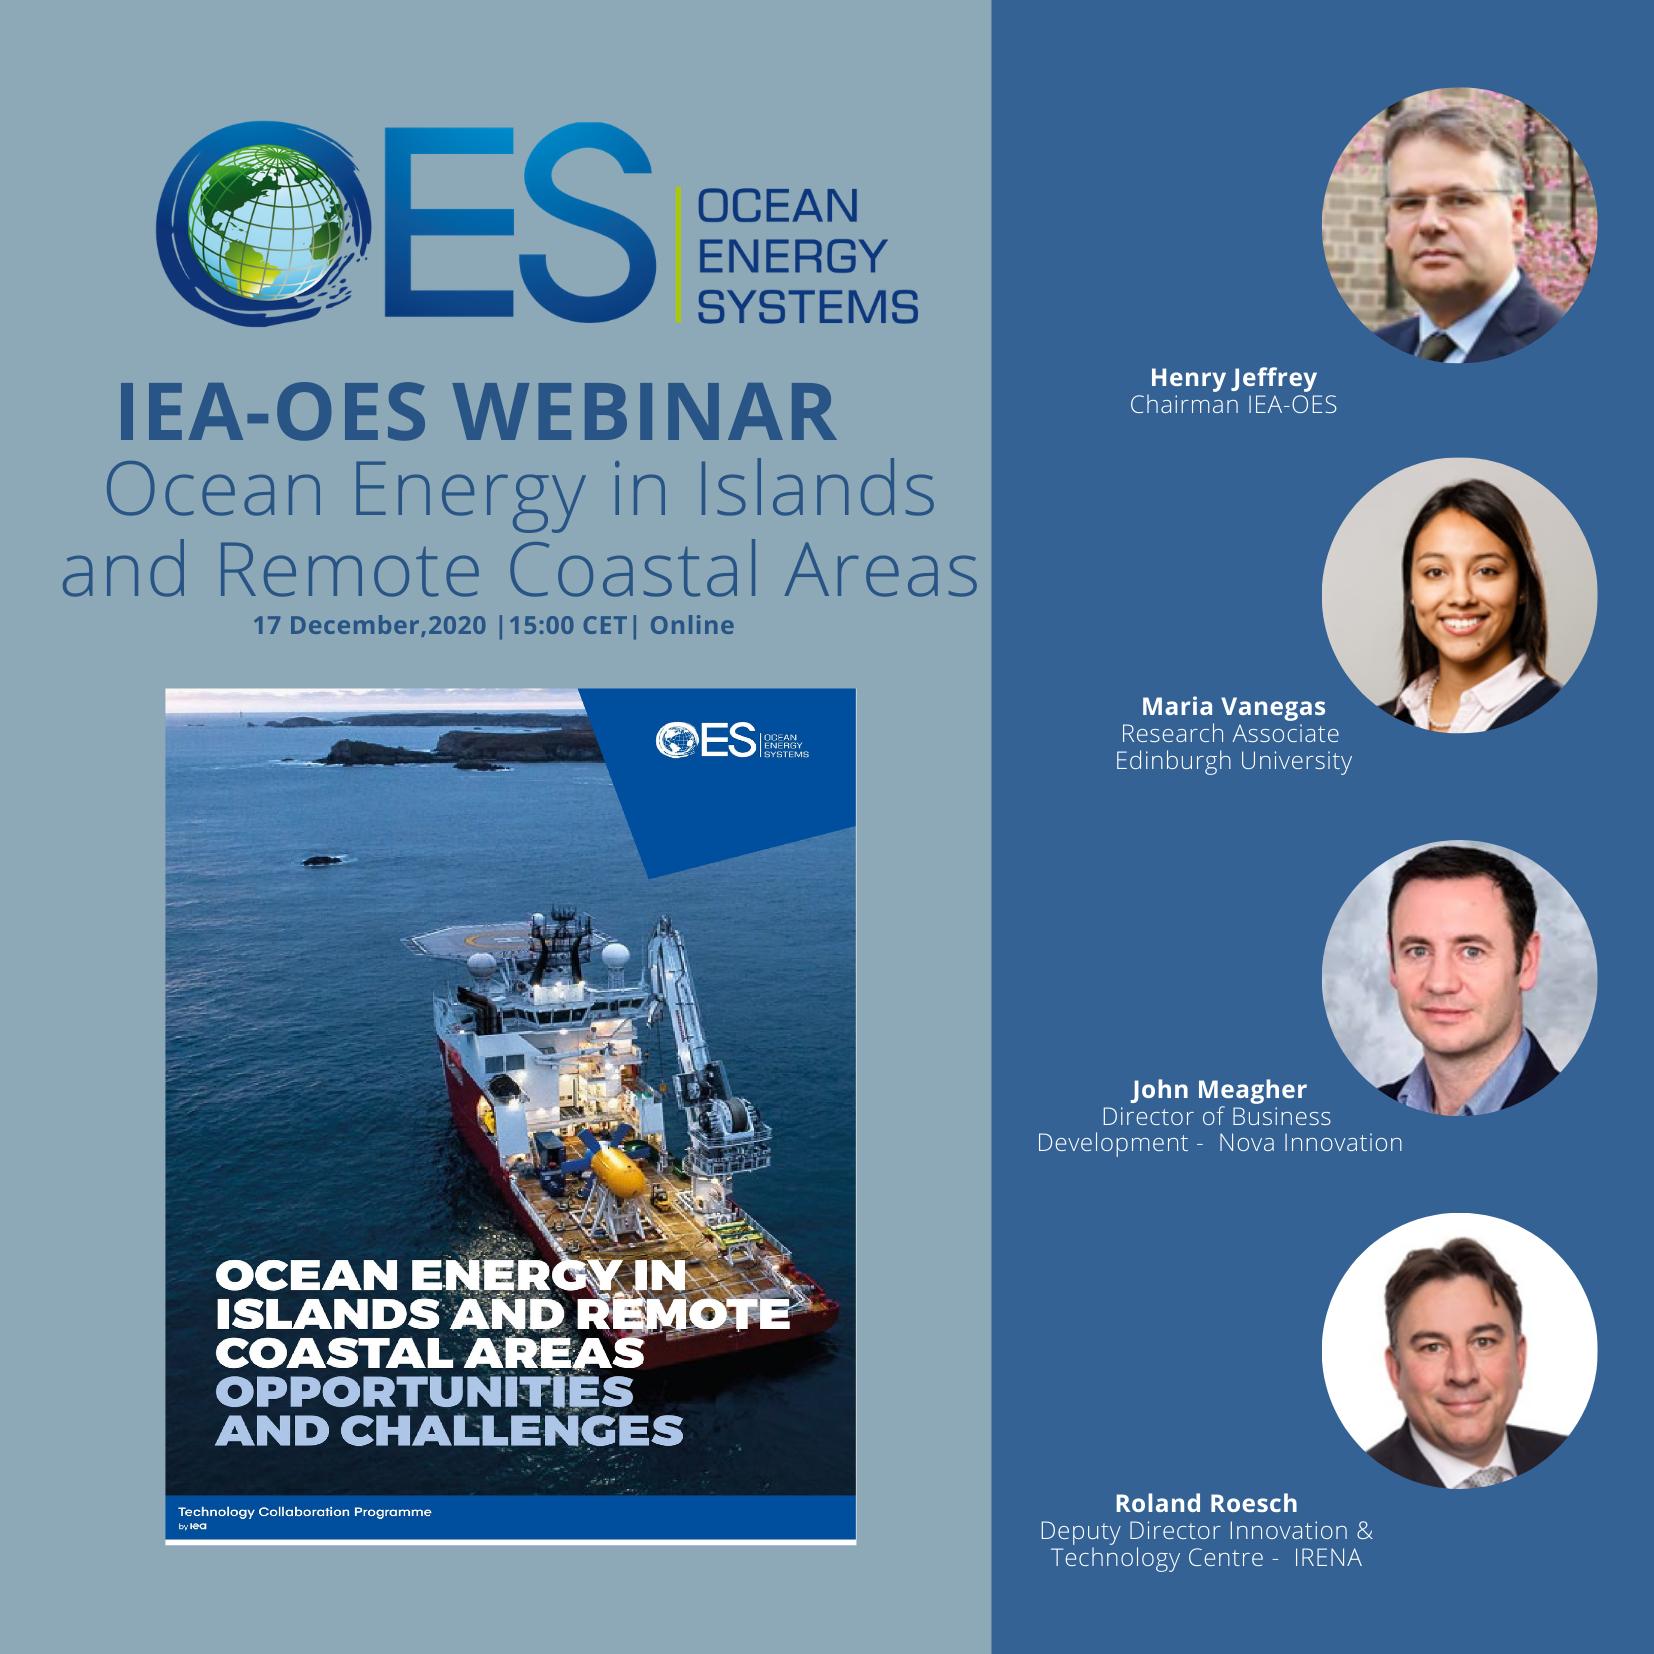 42646-iea-oes-webinar-ocean-energy-in-islands-and-remote-coastal-areas-14122020.png